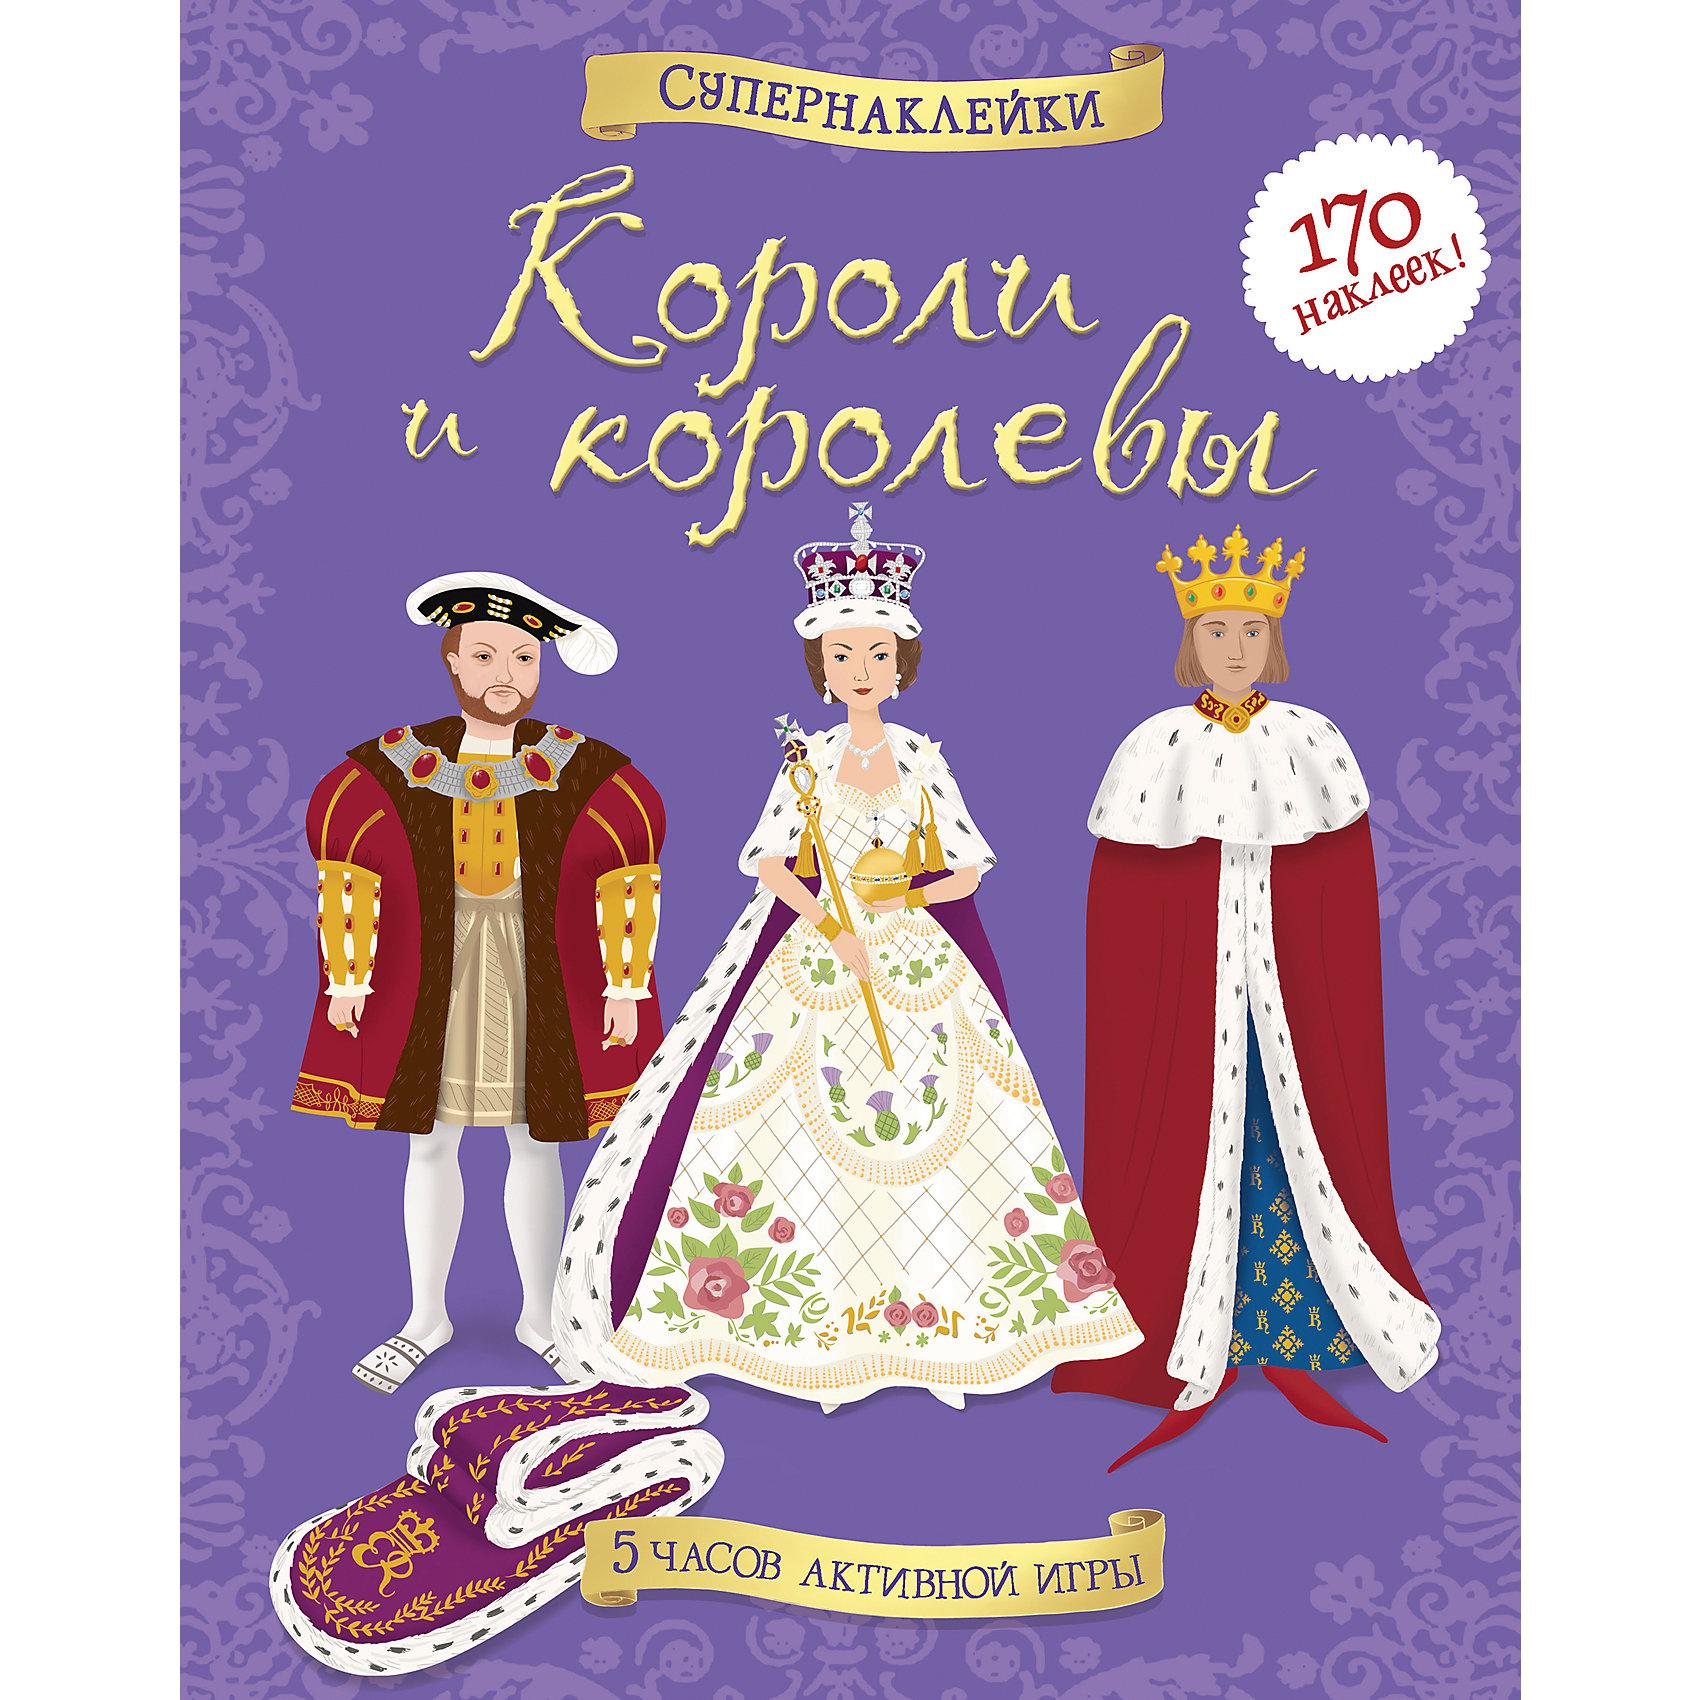 Махаон Короли и королевы, Супернаклейки книги издательство махаон короли и королевы